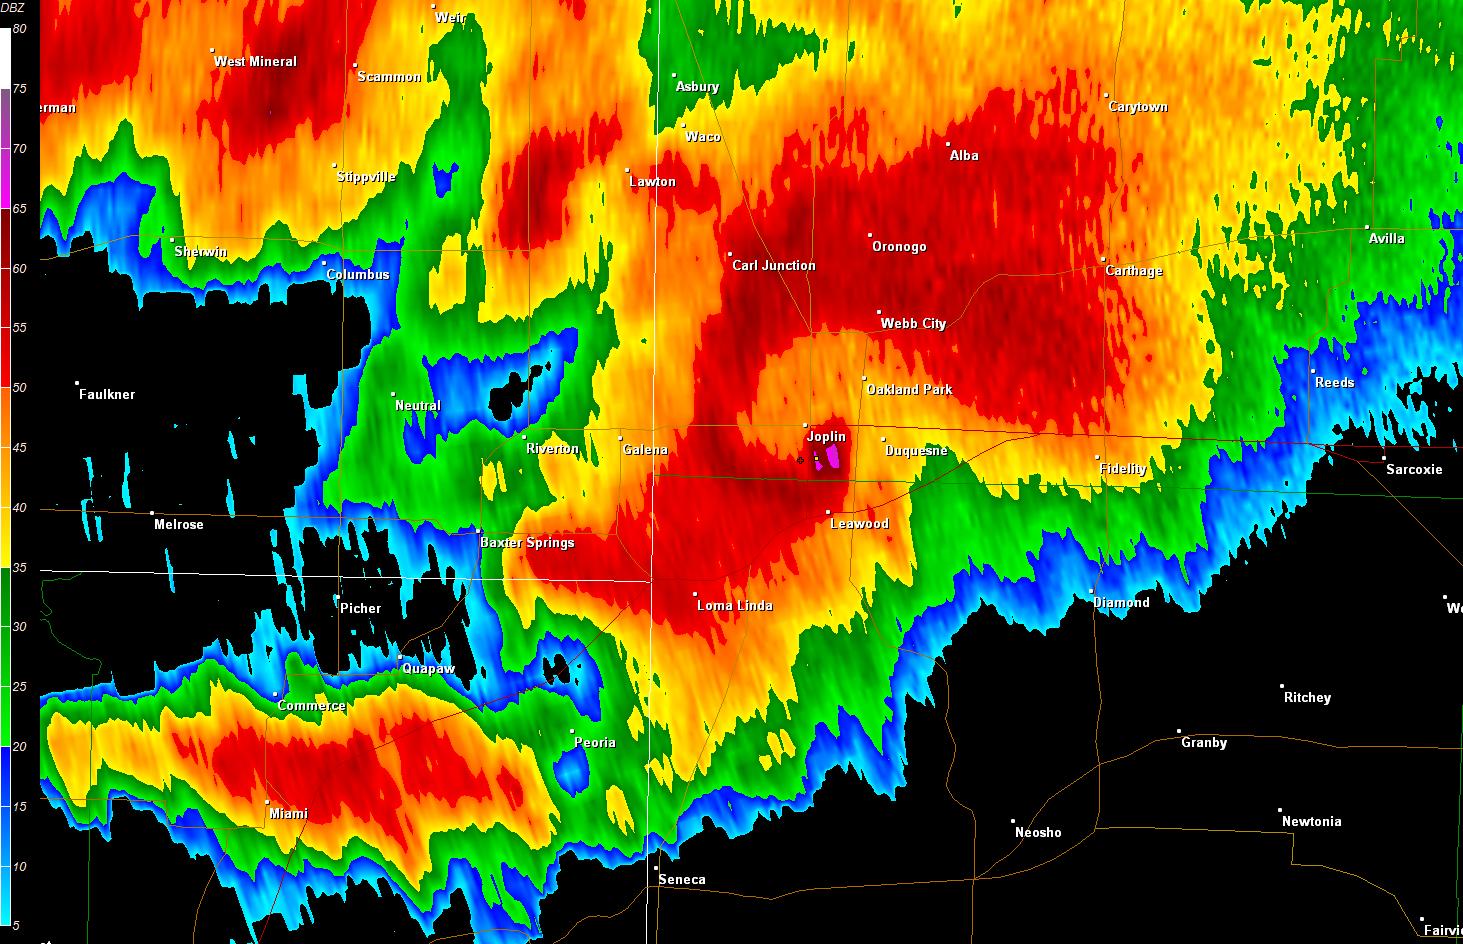 EF-5 tornado near Joplin, MO on May 22, 2011